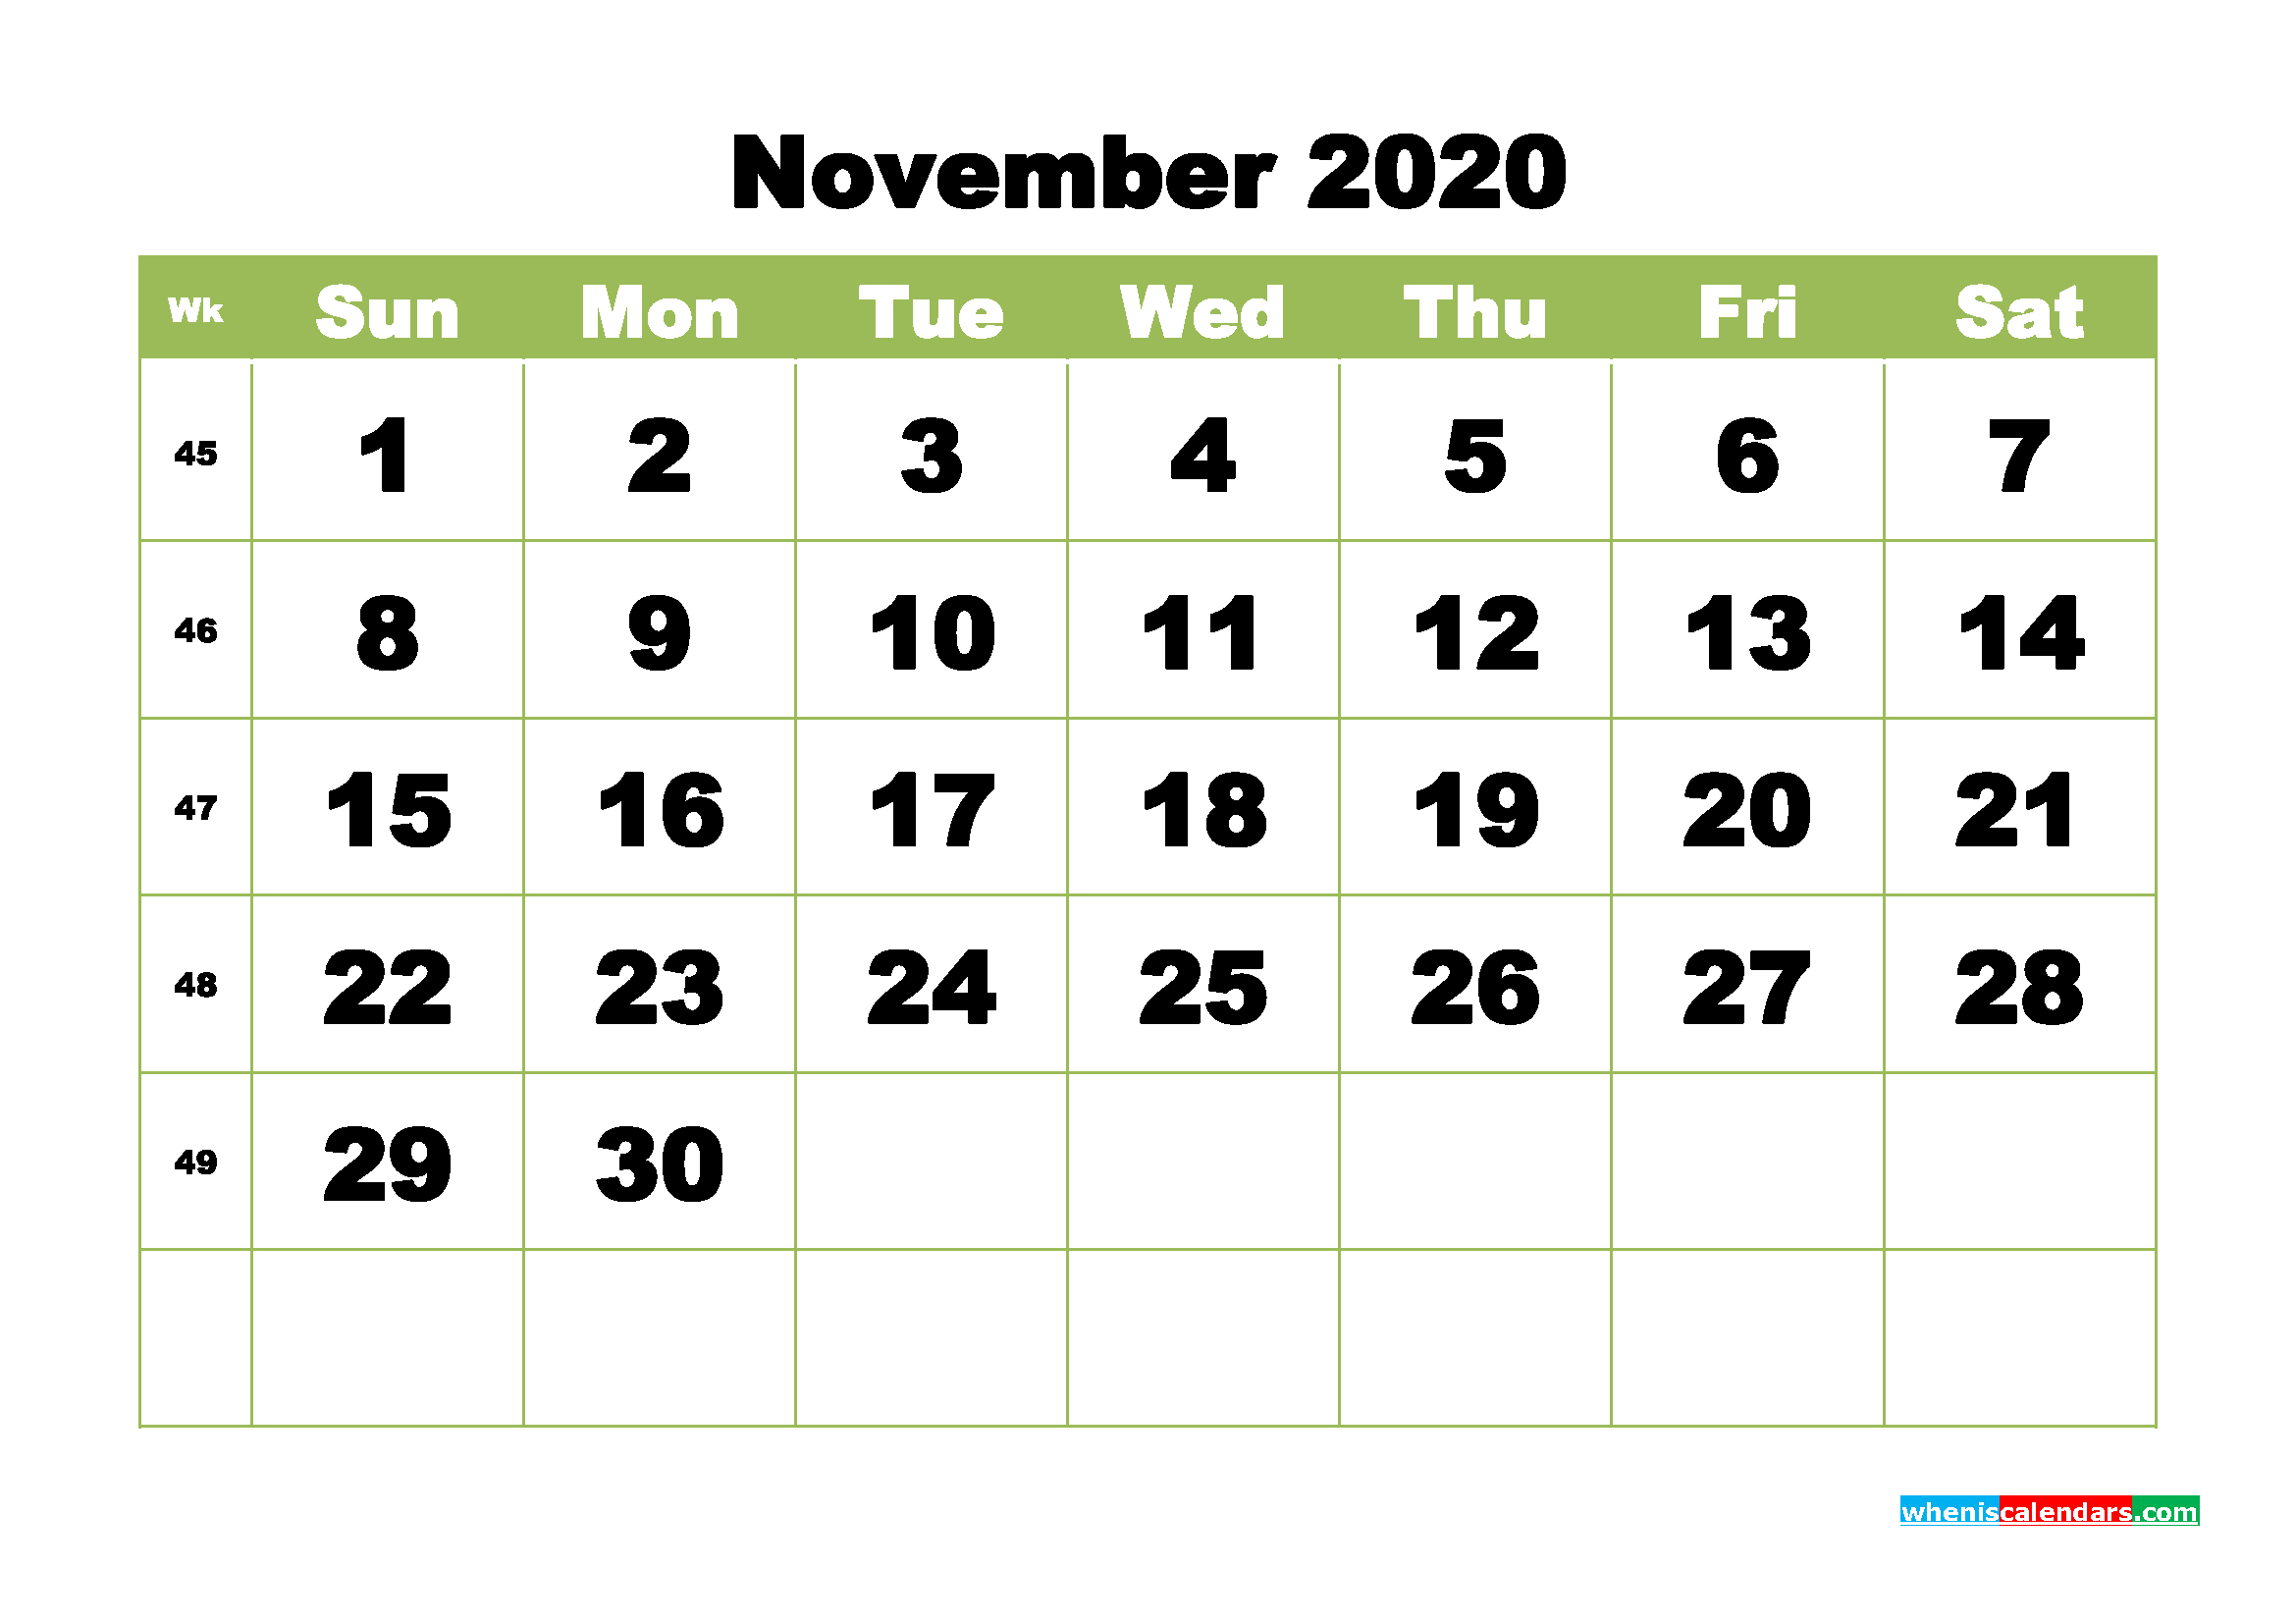 Free Printable Calendar November 2020 Pdf, Word - No.m20B371